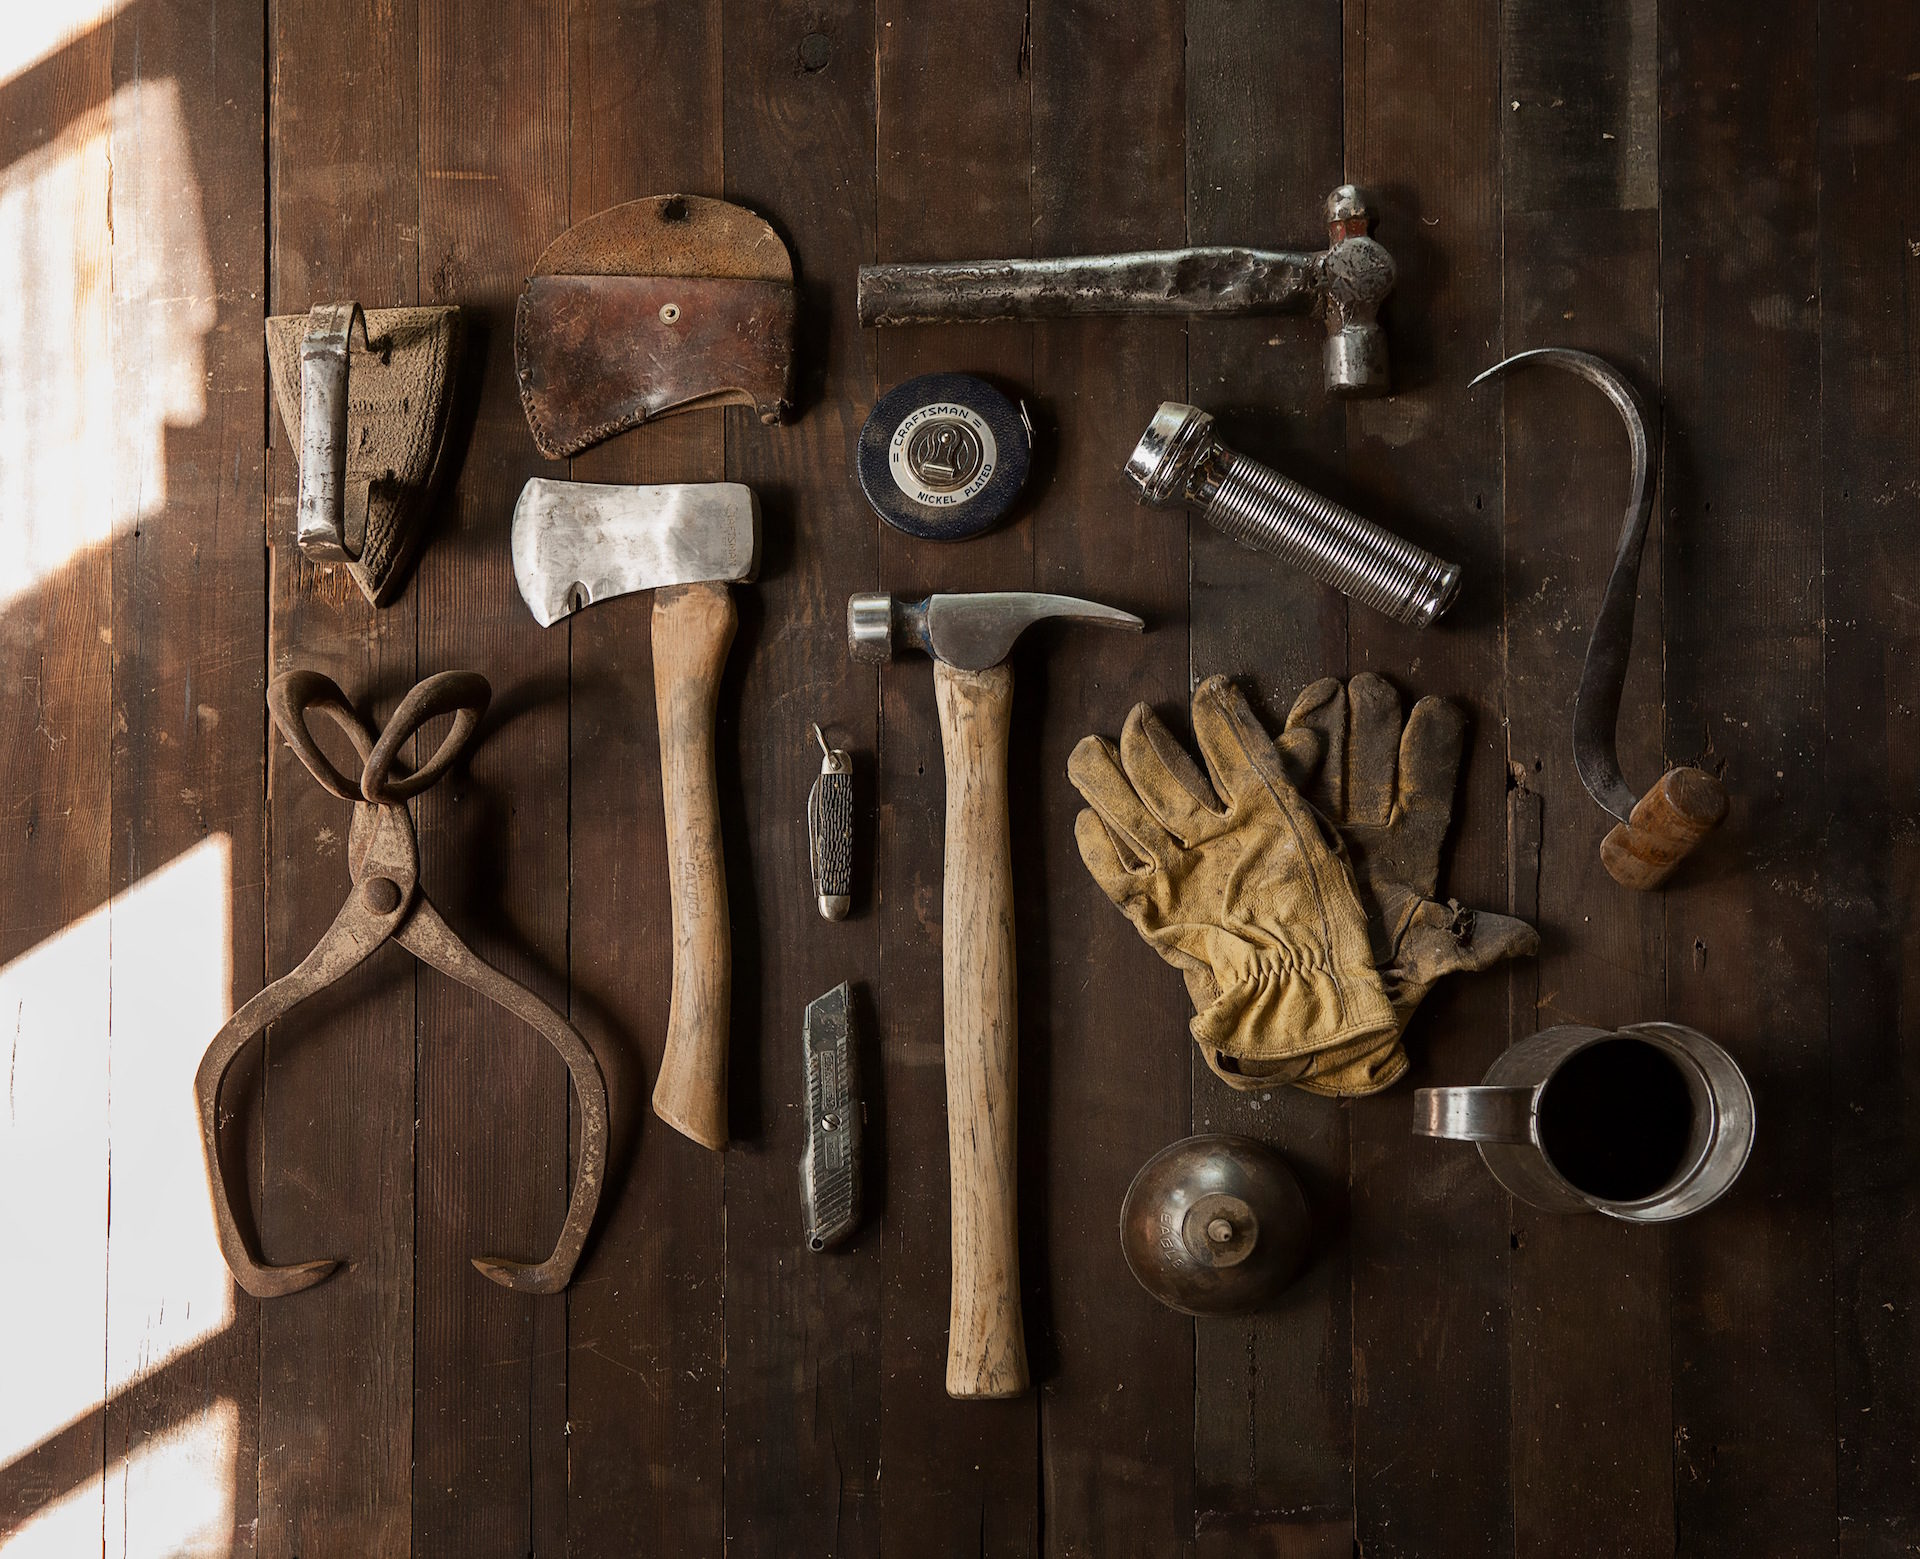 工具, 餐具, 手套, hacha, martillo - 高清壁纸 - 教授-falken.com